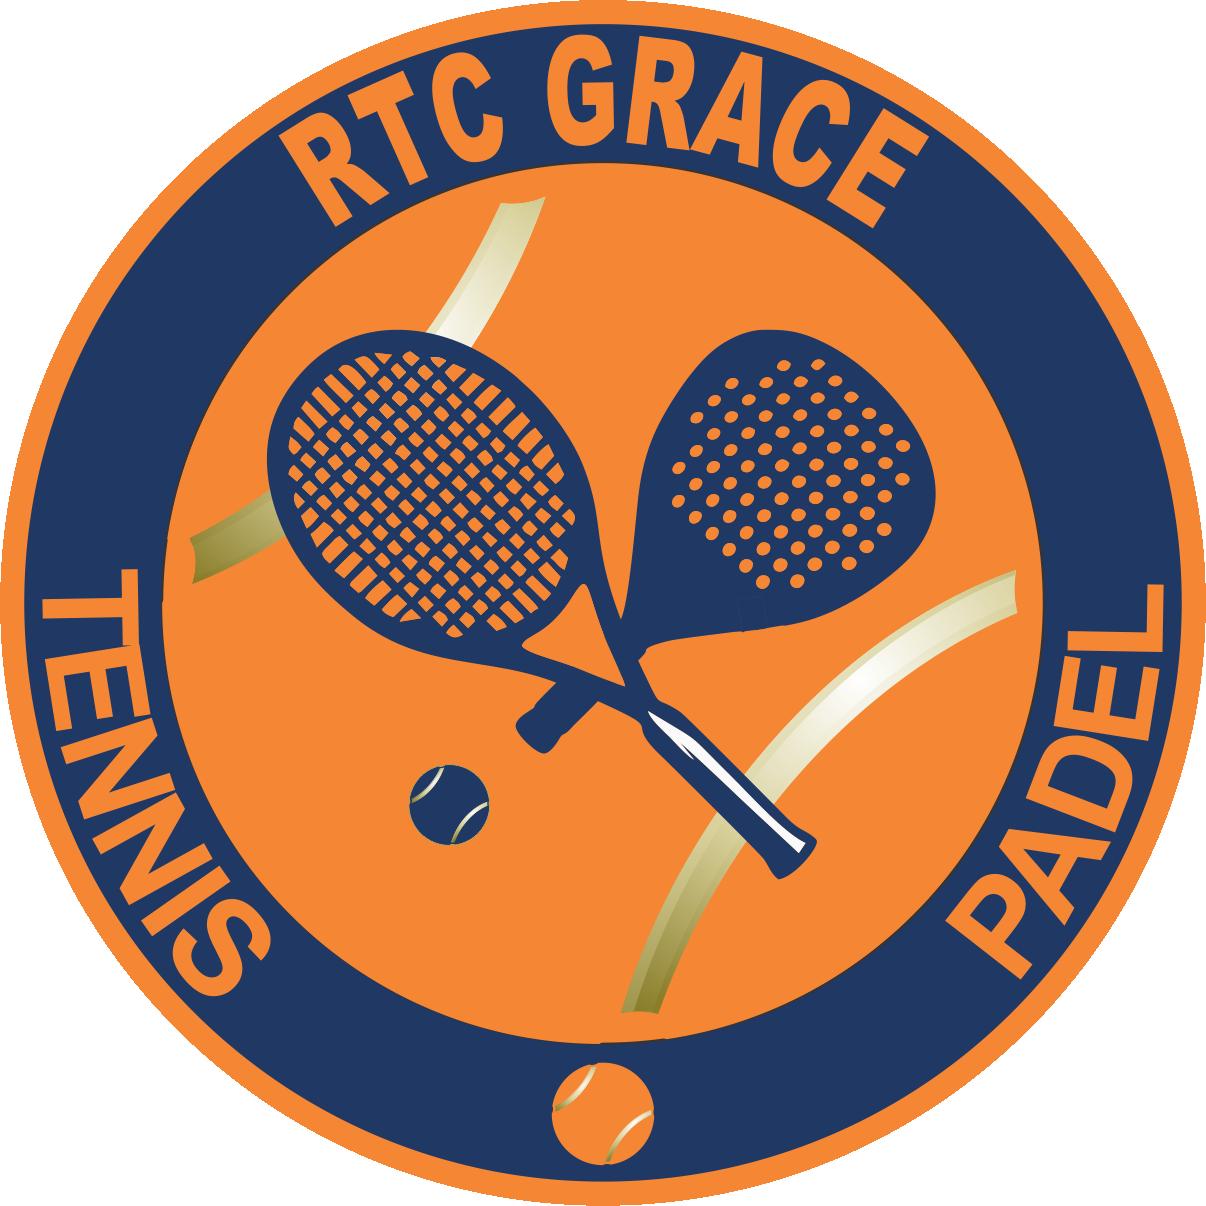 Royal Tennis Club de Grâce